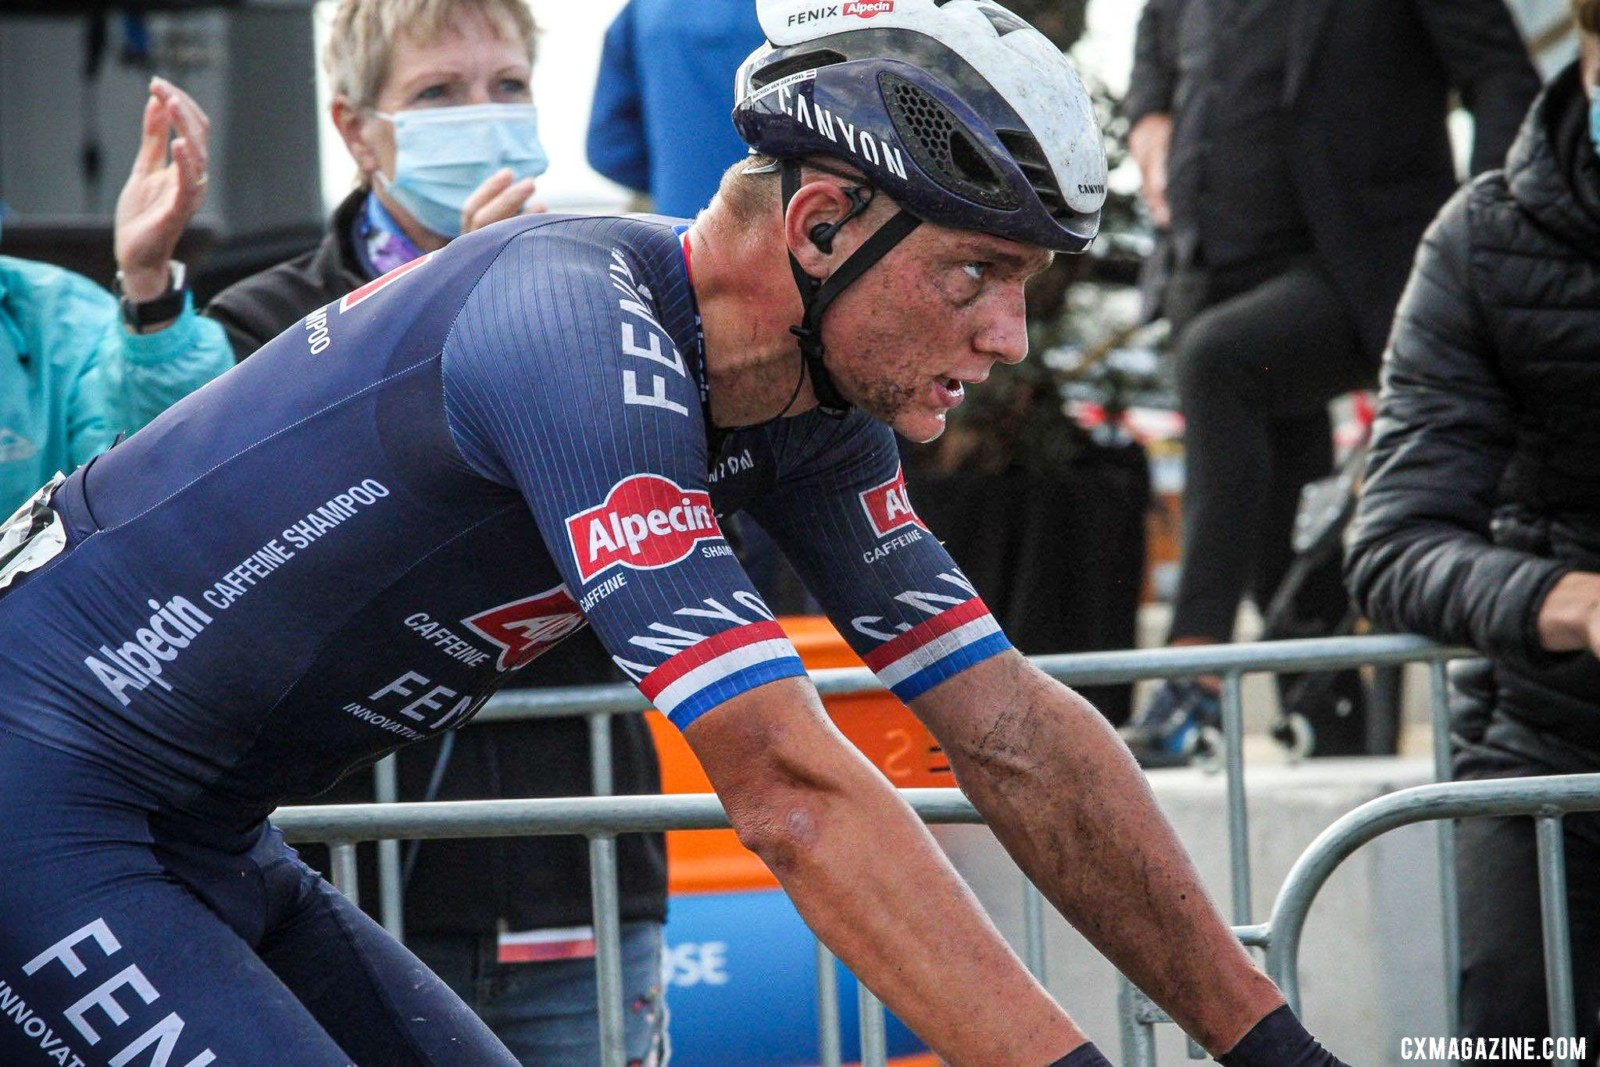 Mathieu van der Poel (Alpecin-Fenix) wins the 2020 Dutch Road National Championships. © B. Hazen / Cyclocross Magazine